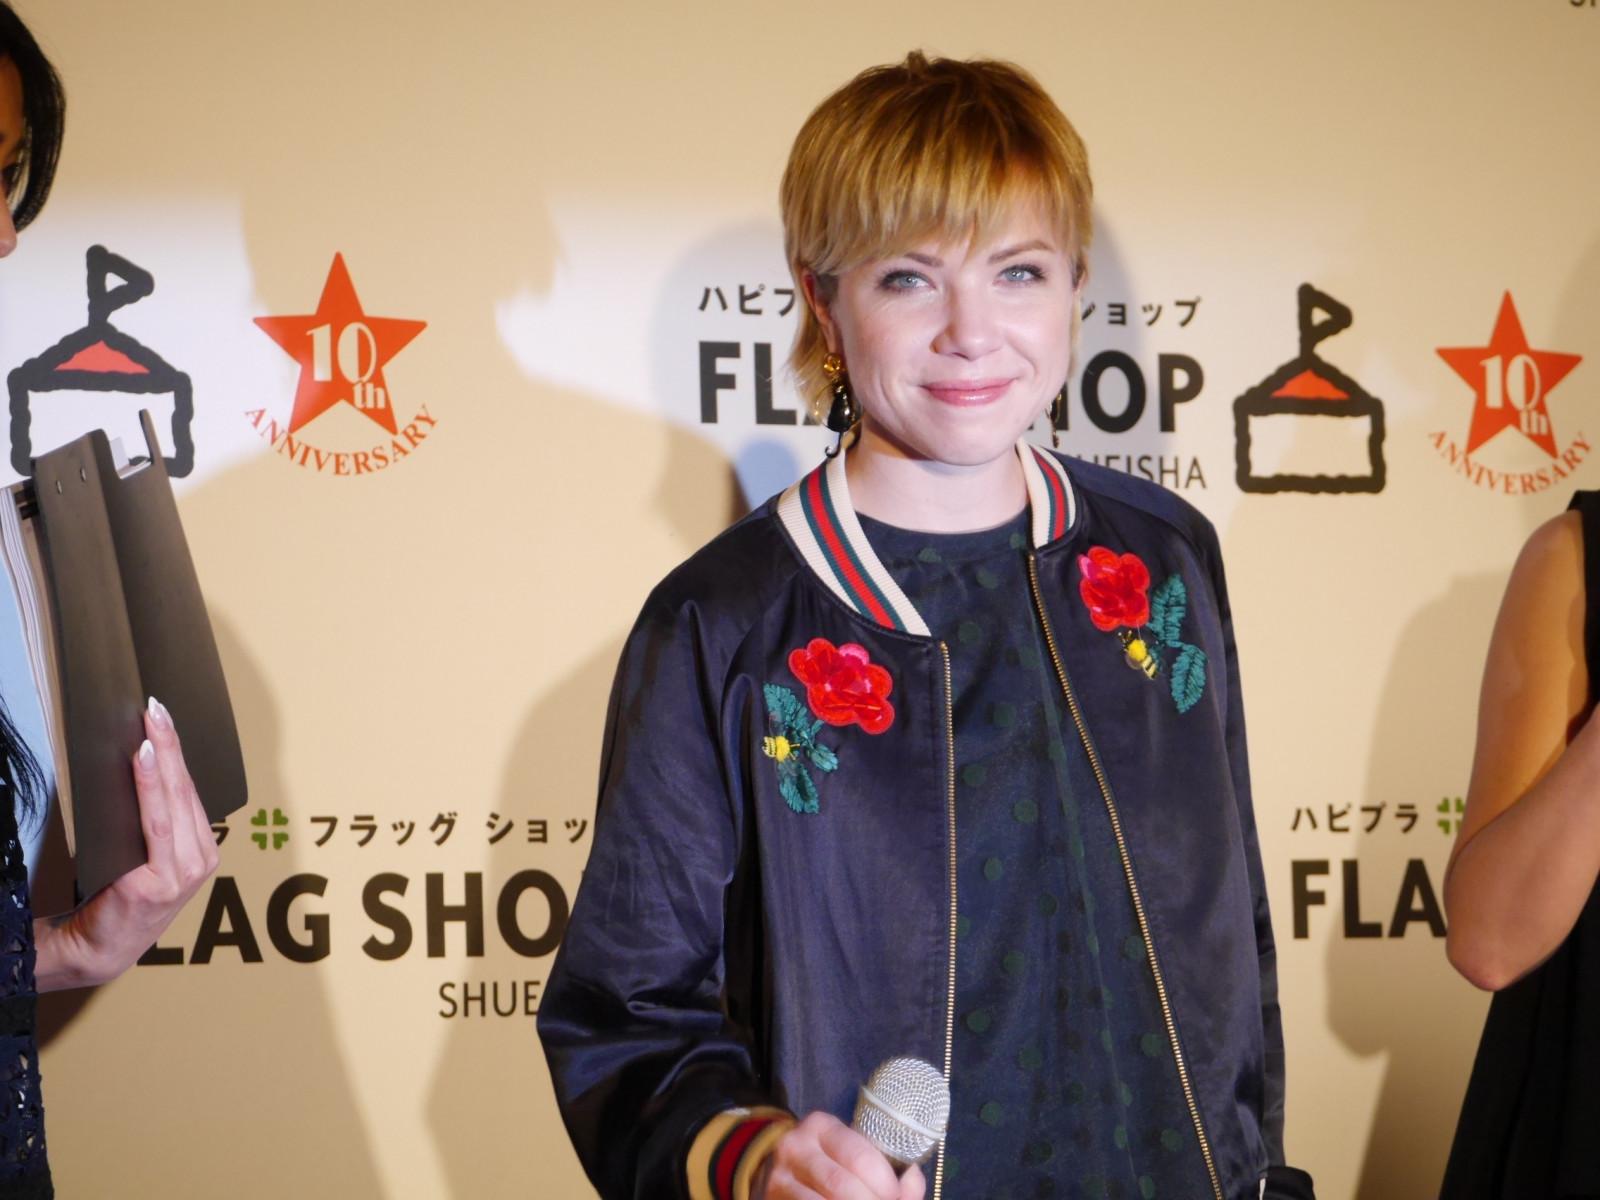 FLAG SHOPの10周年記念イベントにカーリー・レイ・ジェプセンとYOKO FUCHIGAMIがゲストで登場!_1_1